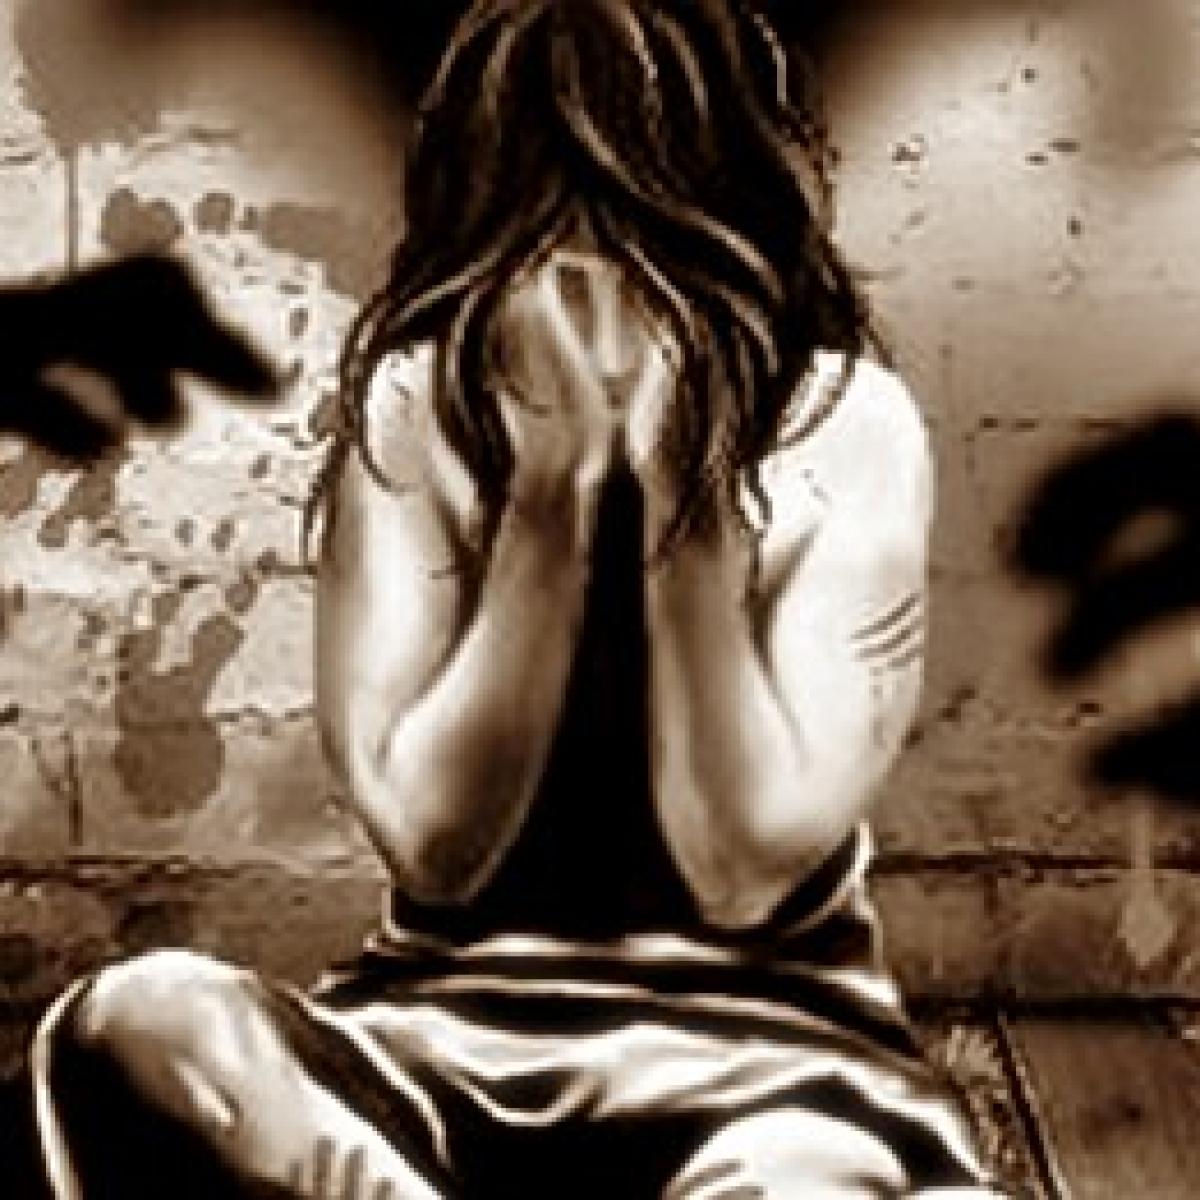 Bhopal: Cop sedates constable, rapes her at a hotel